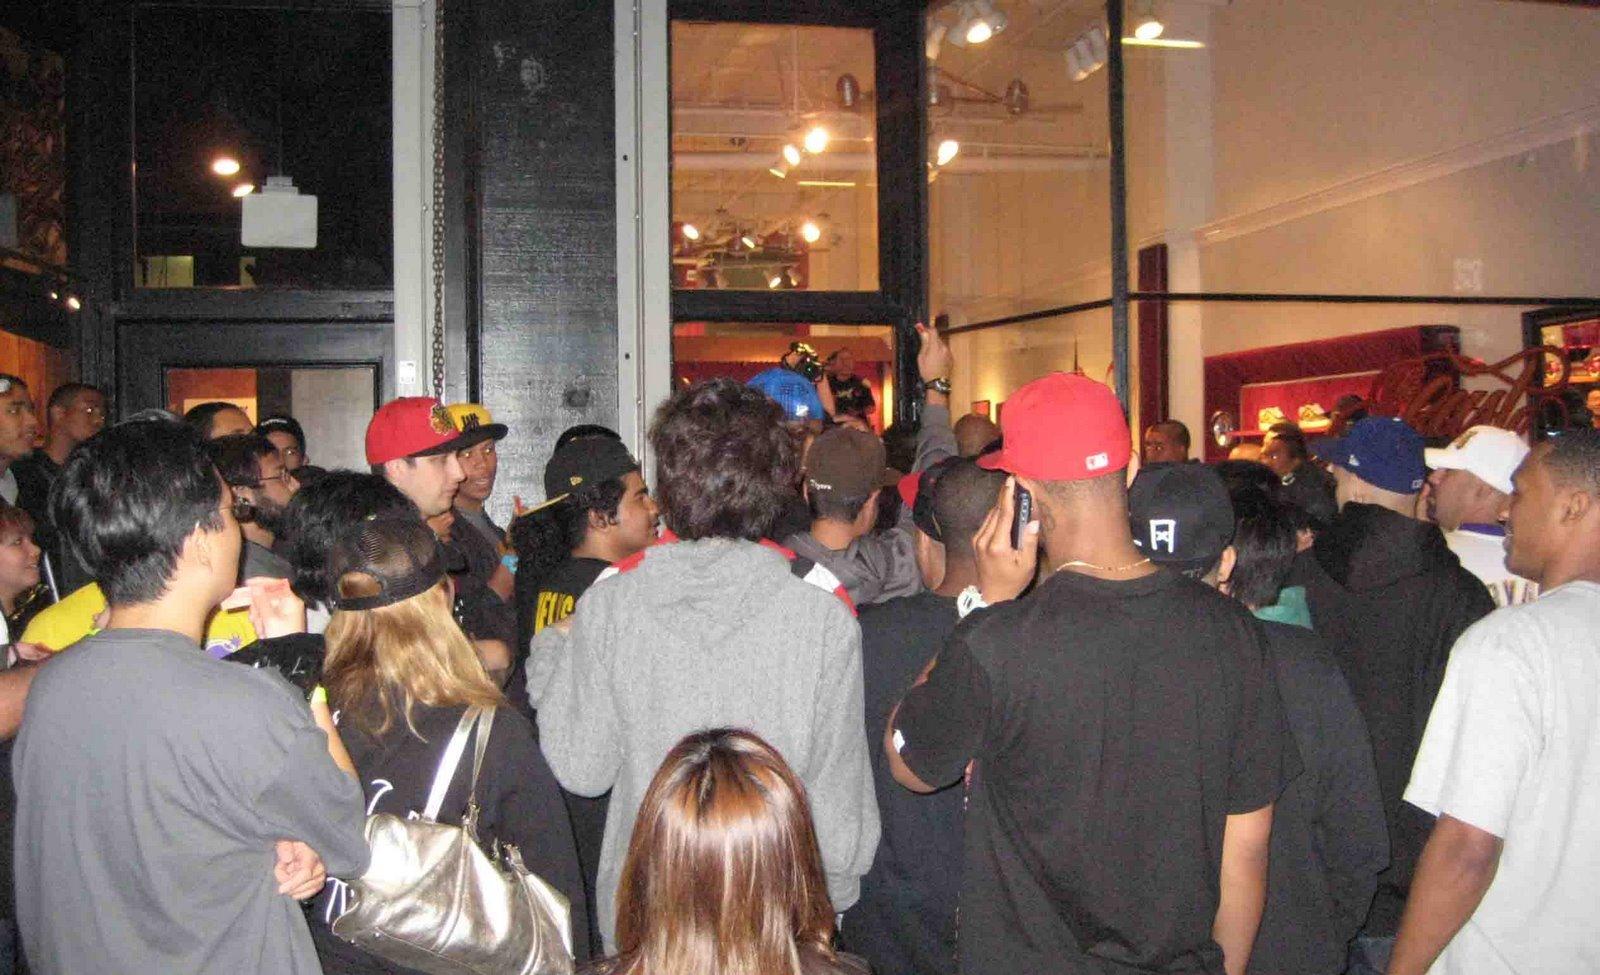 [crowd]